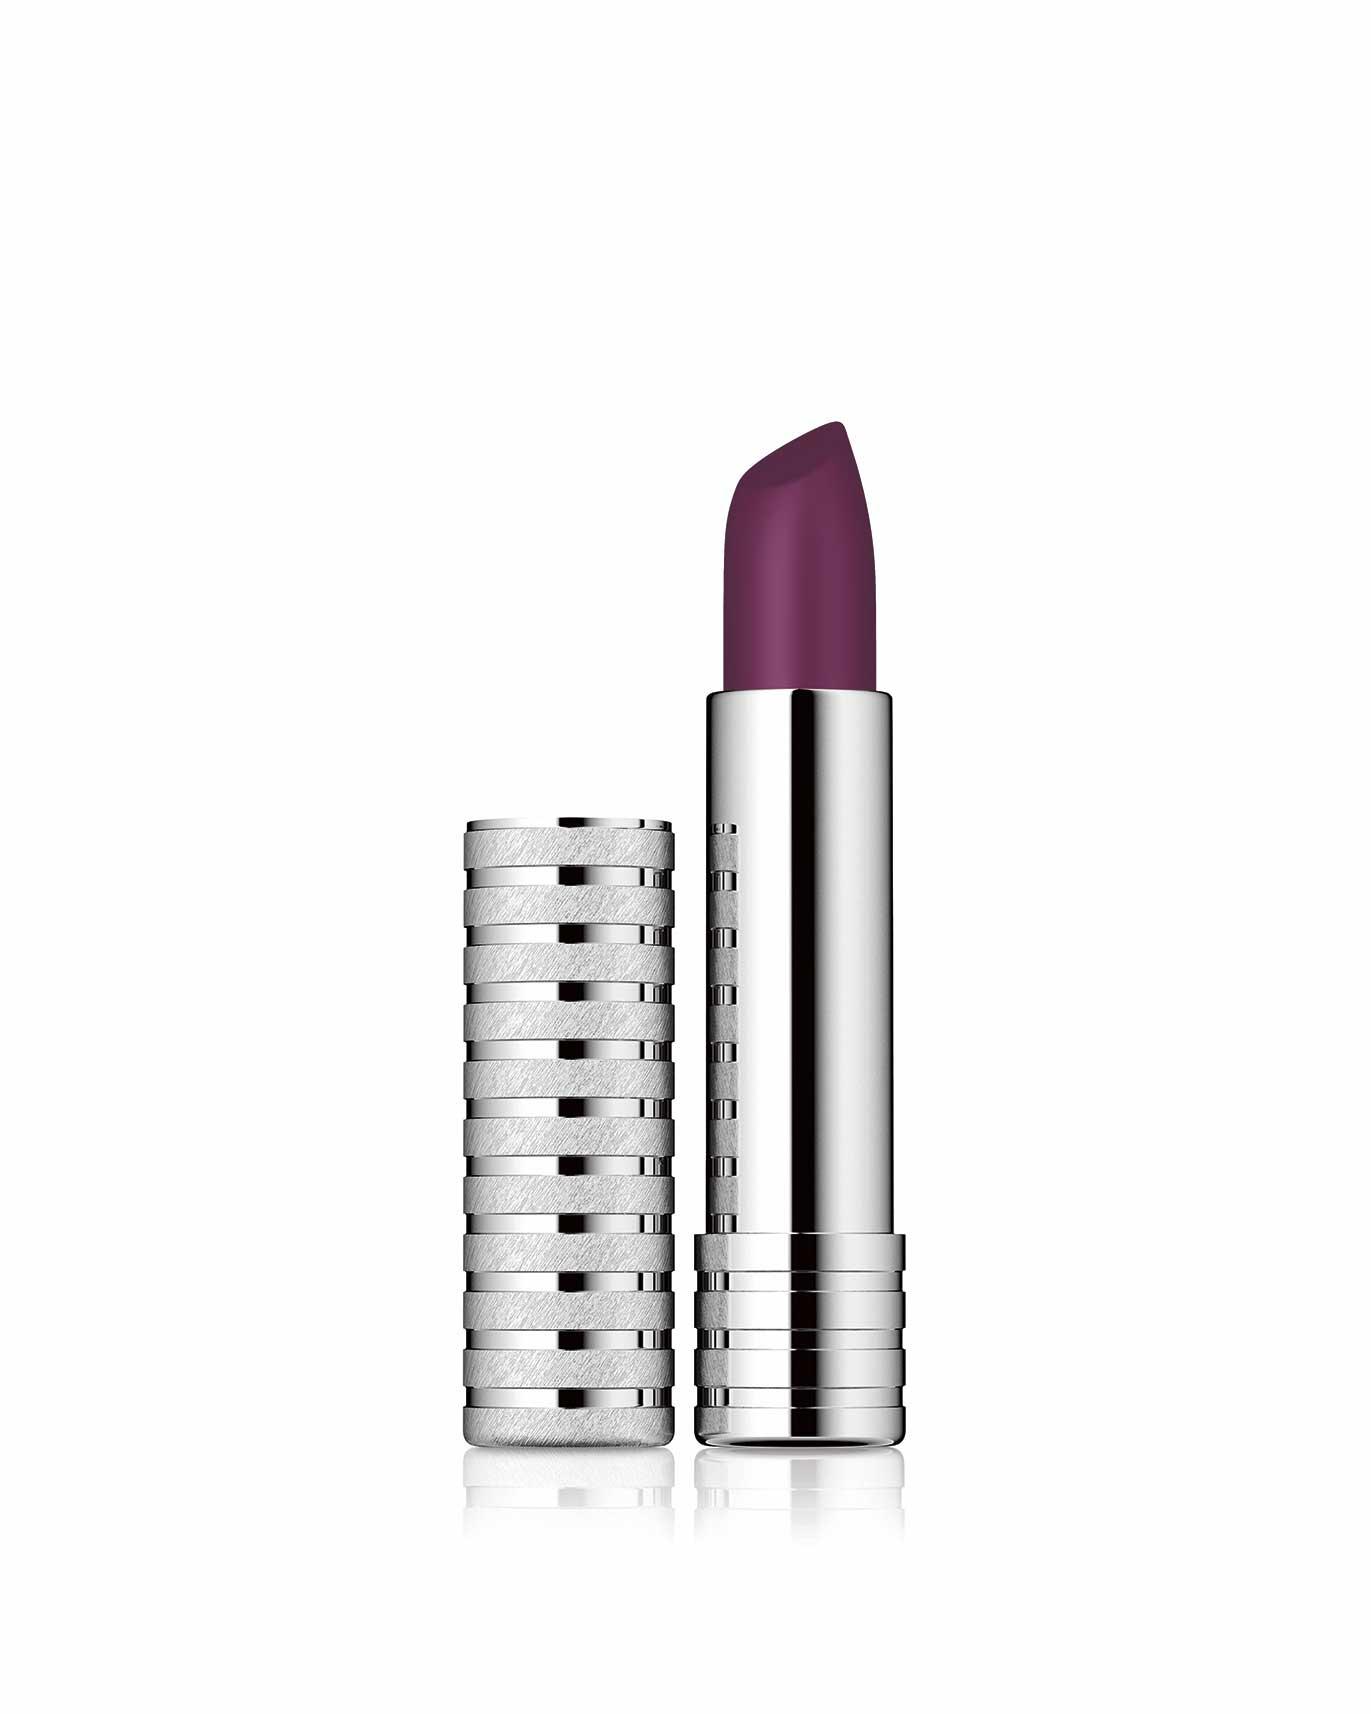 Clinique-Long-Last-Lipstick-Soft-Matte-in-Plum_web.jpg